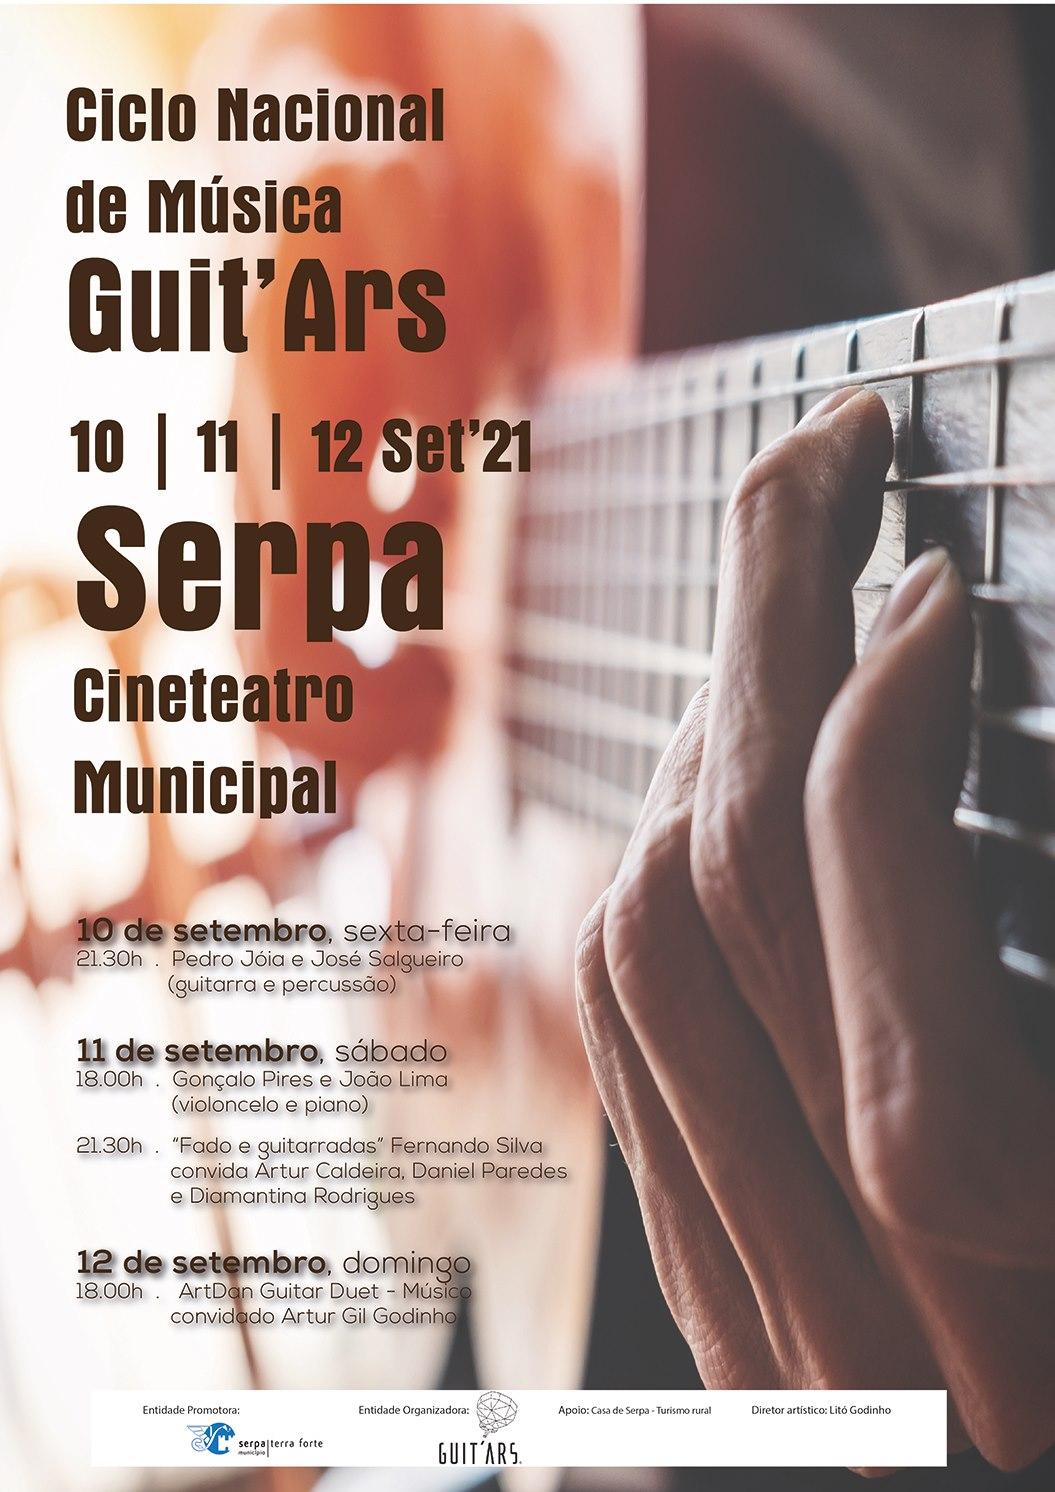 Ciclo Nacional de Música Guit'Ars